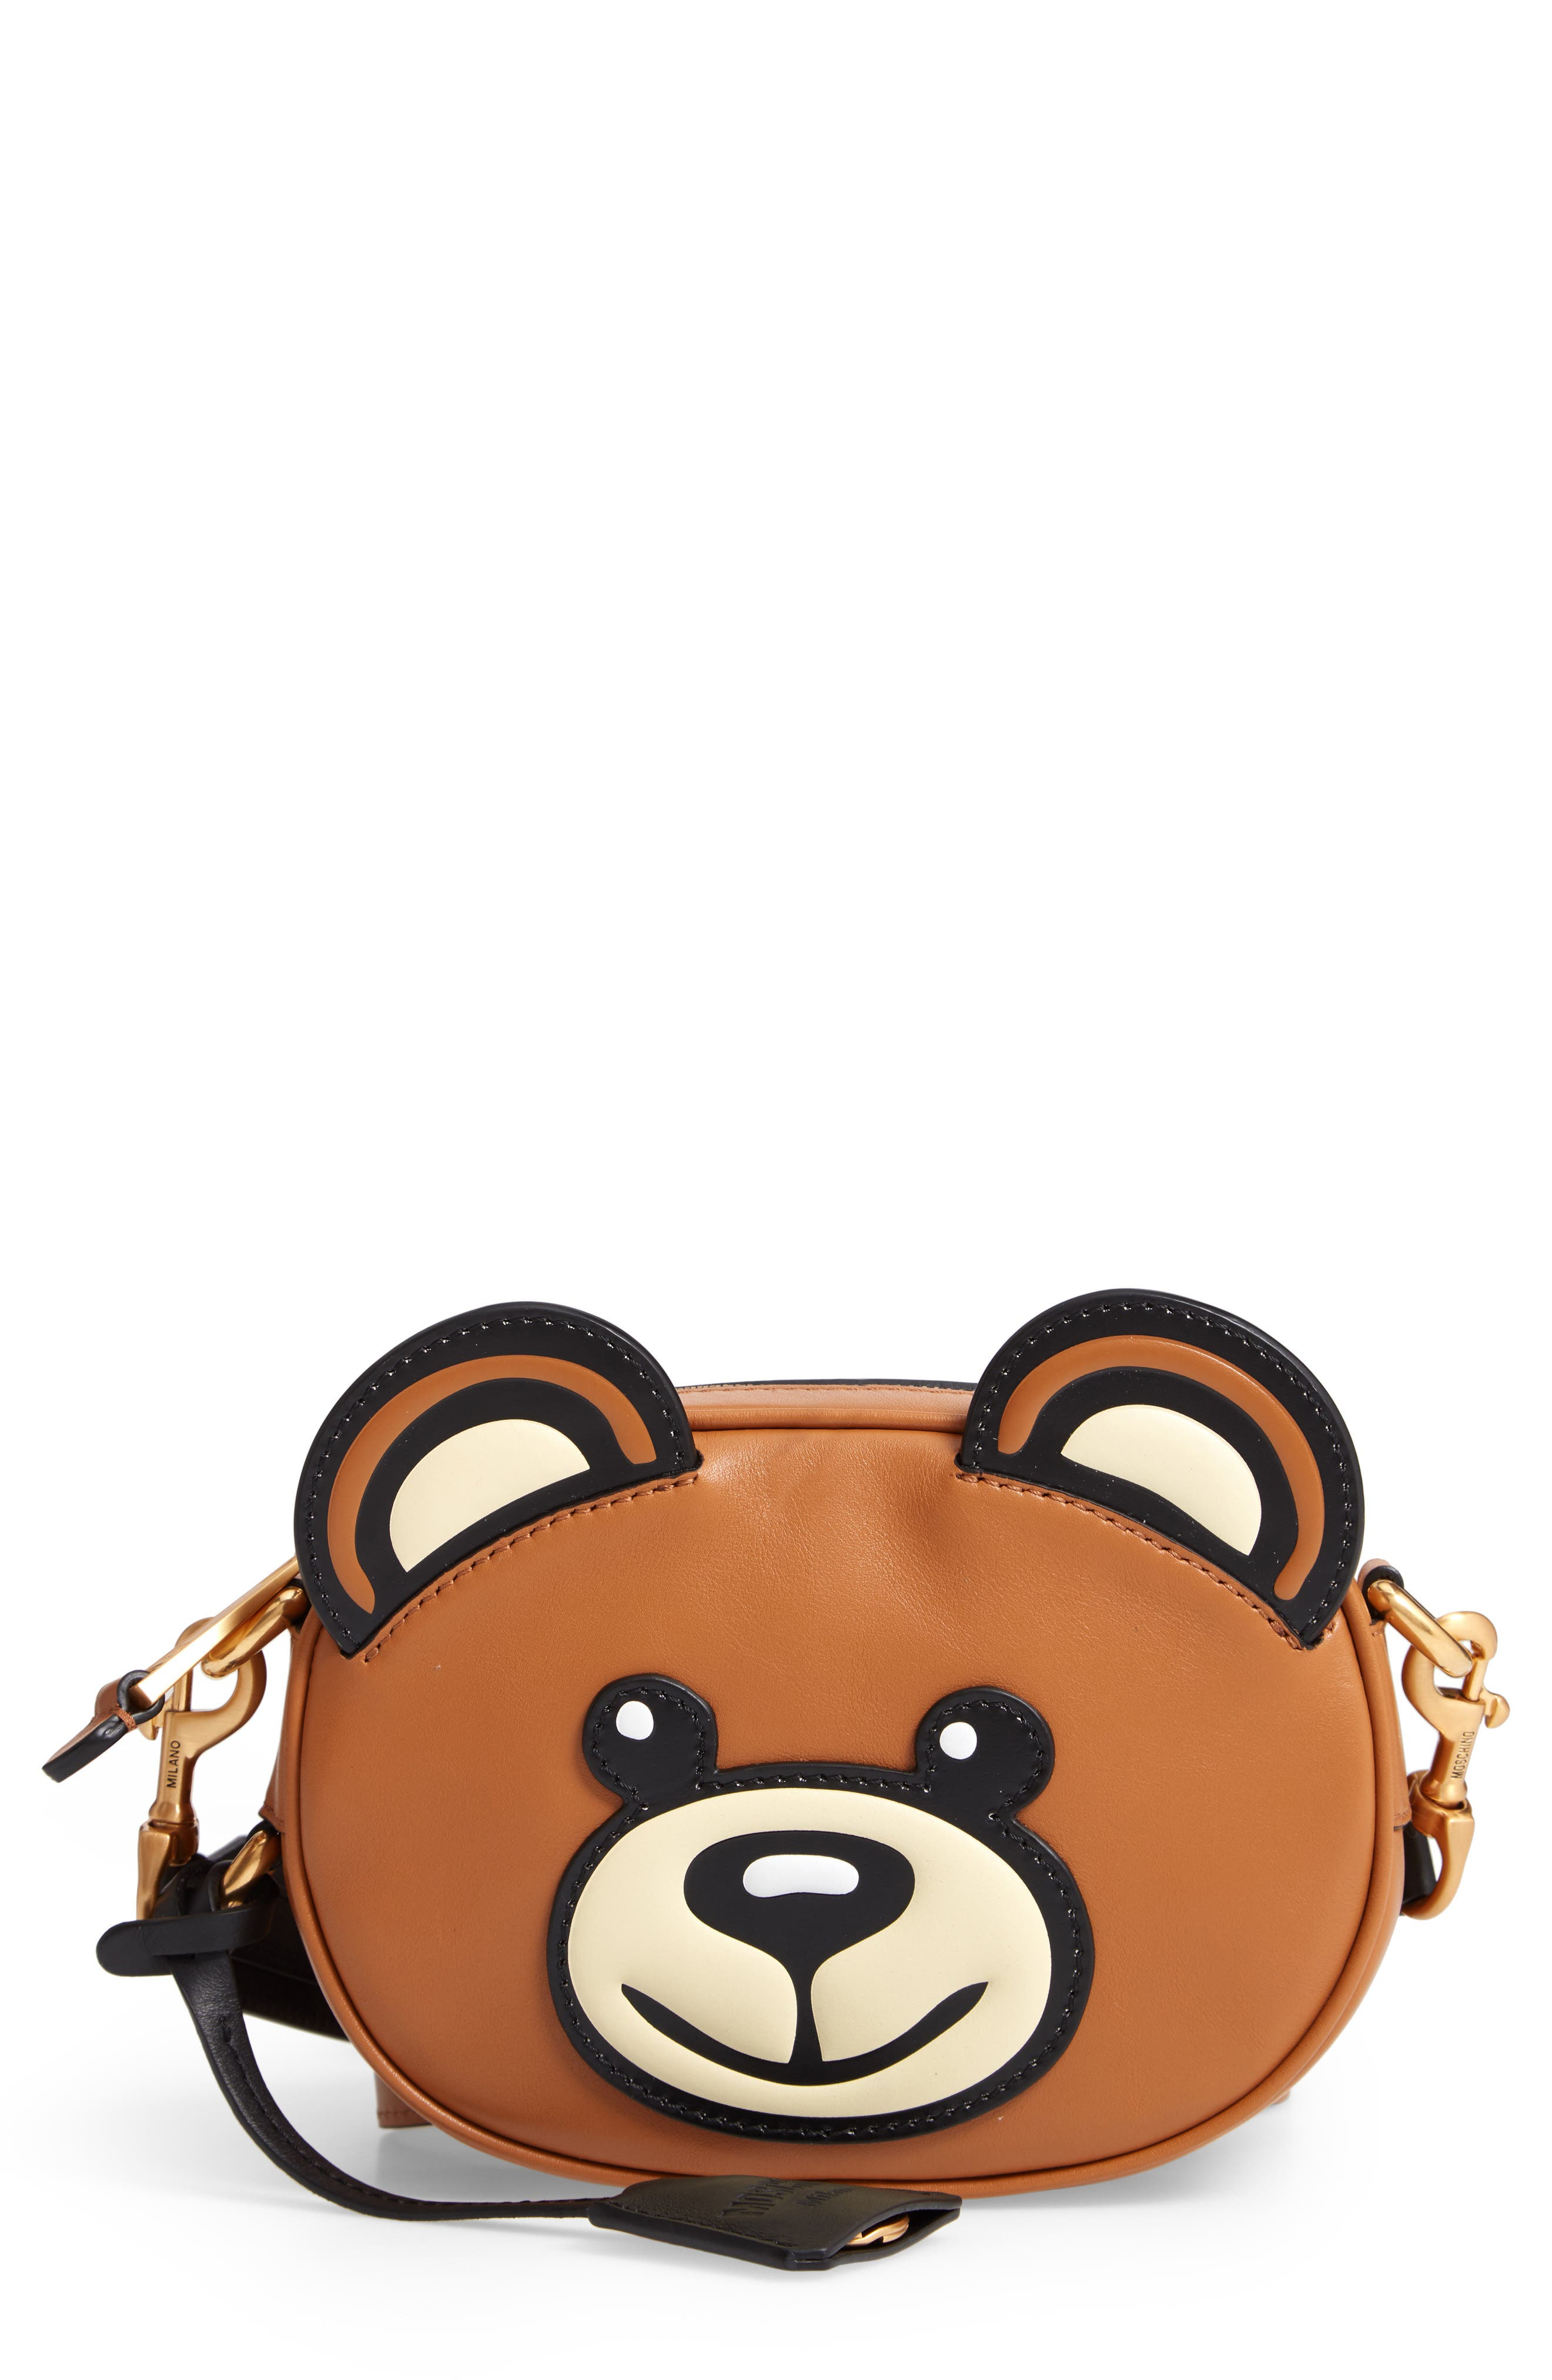 Crystal Teddy Leather Crossbody Bag, Main, color, BROWN